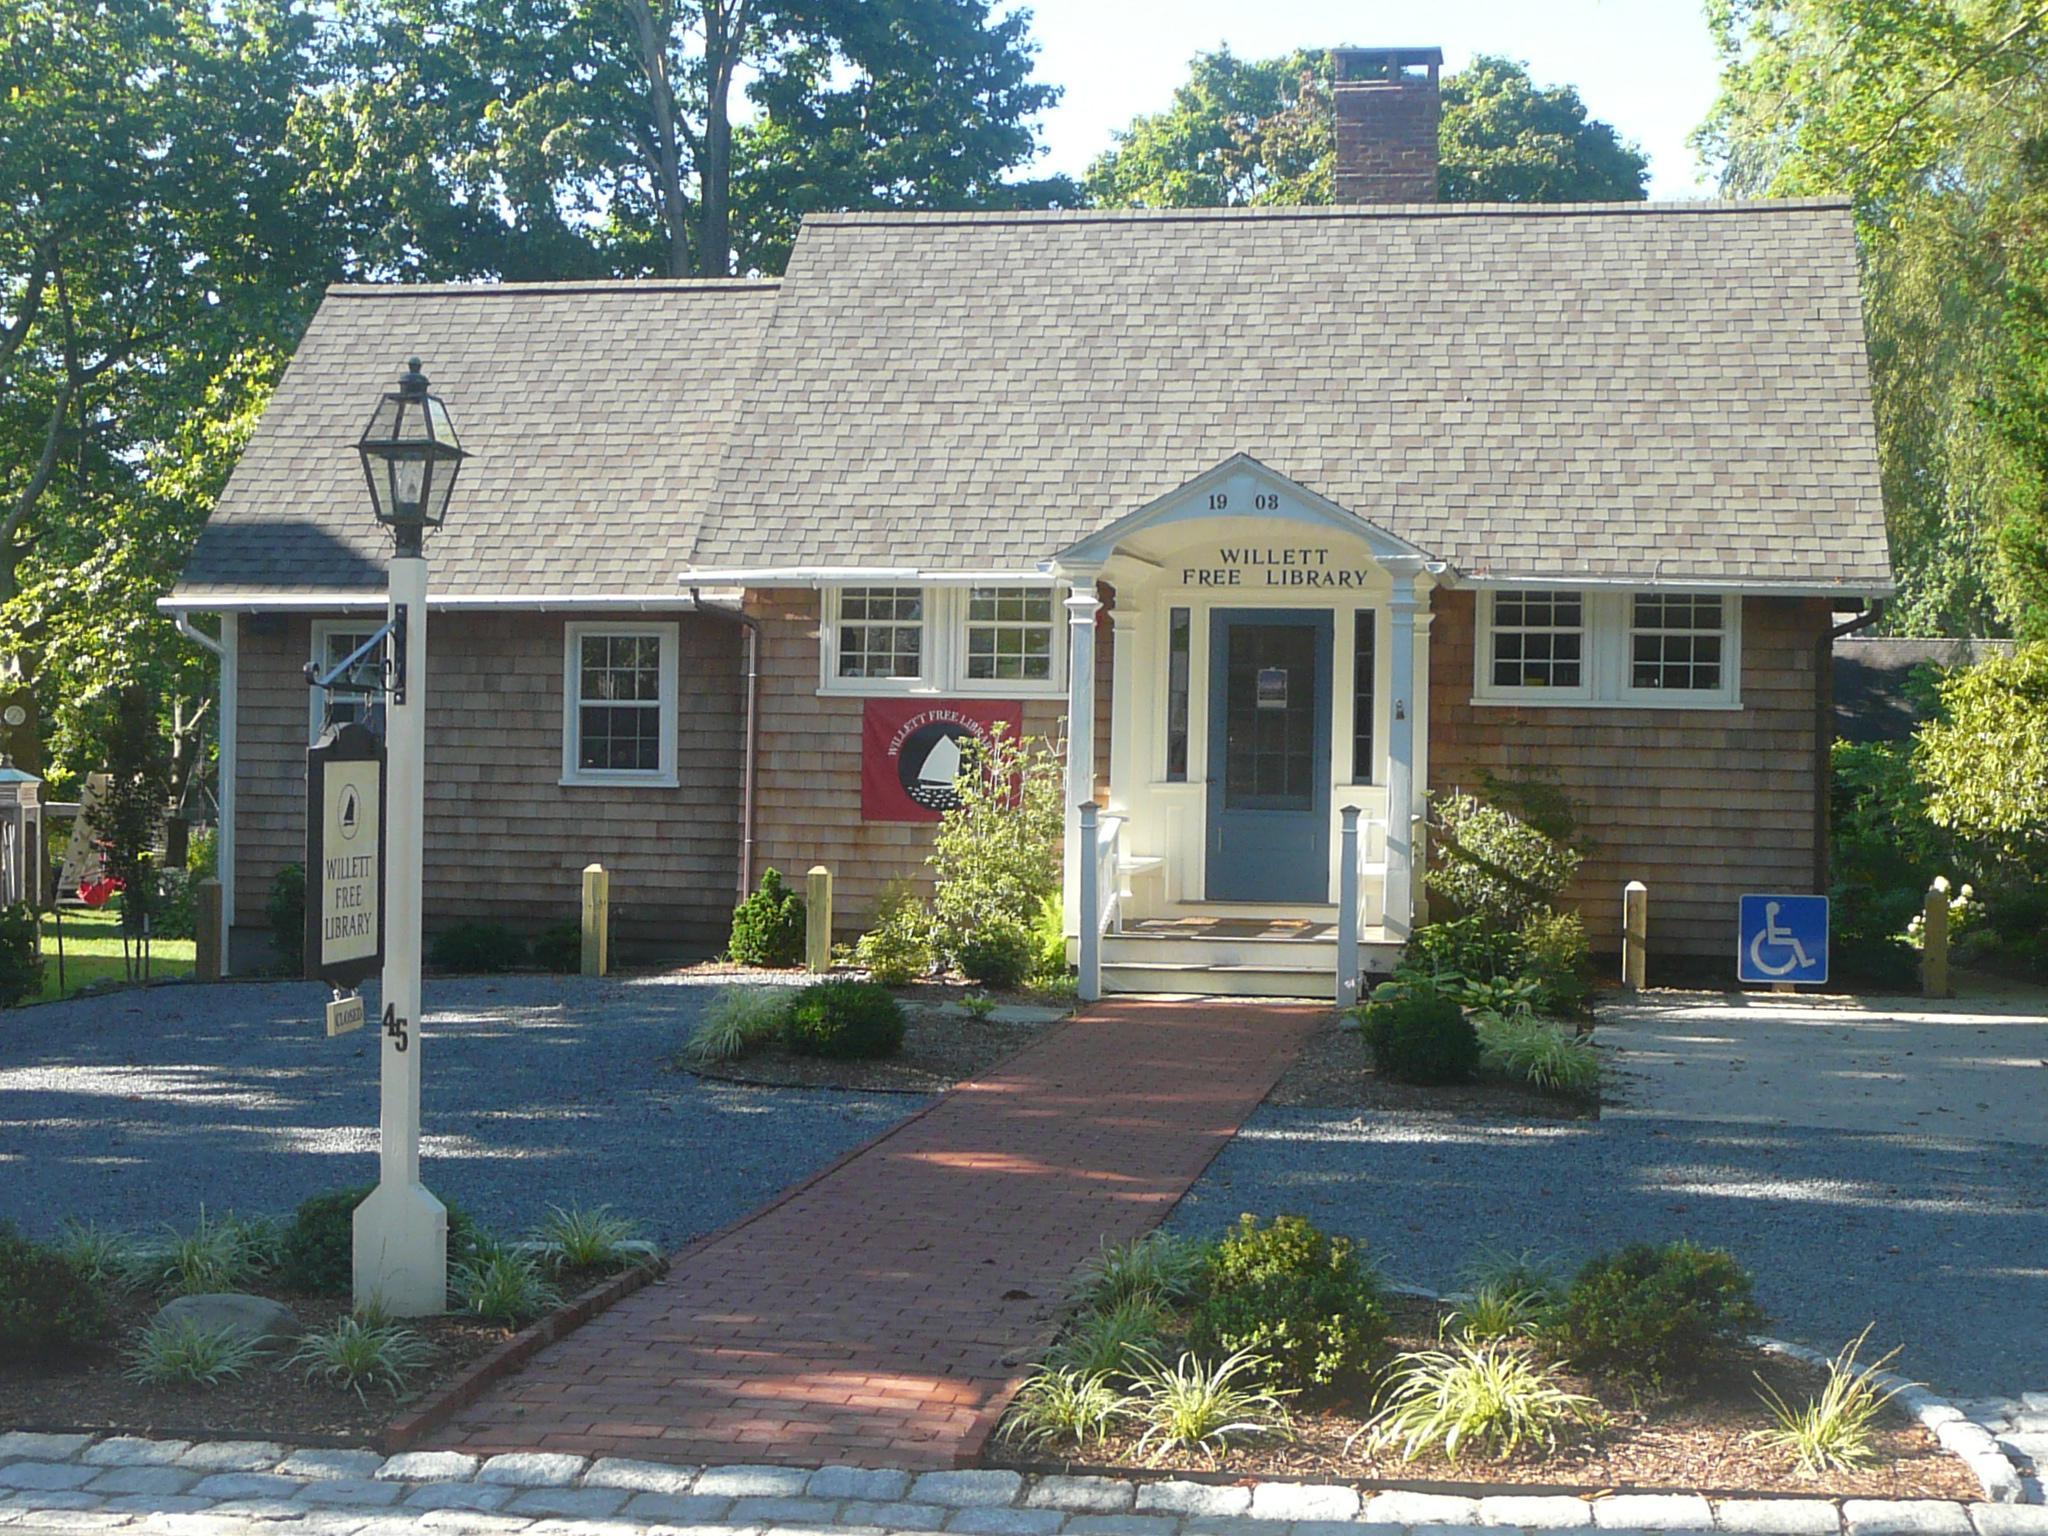 Willett Free Library